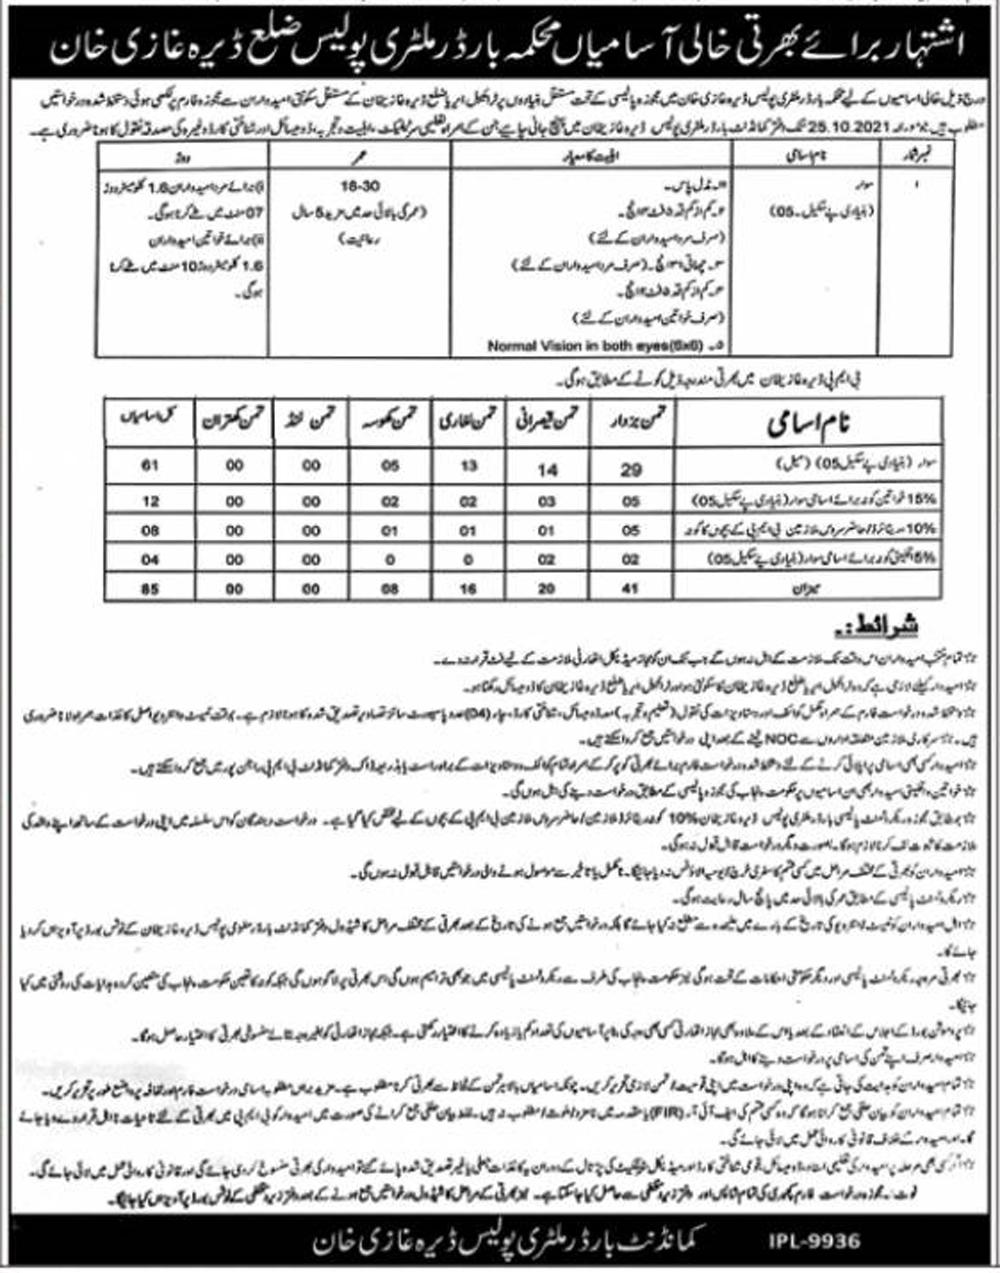 Border Military Police BMP Dera Ghazi Khan Jobs 2021